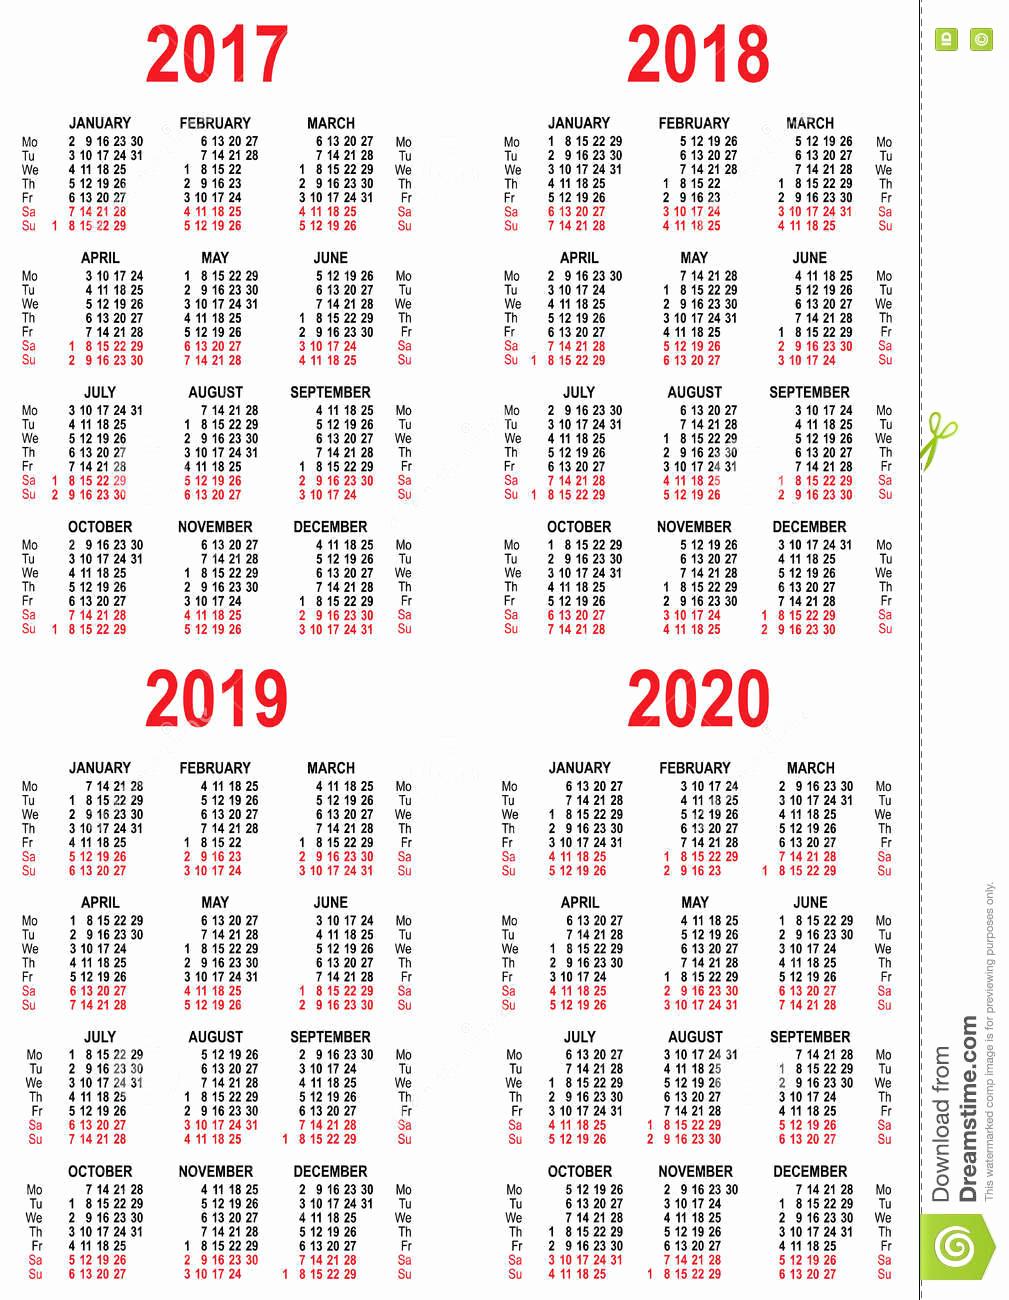 2020 Payroll Calendar  Neyar.kristinejaynephotography inside Uc Berkeley Biweekly Pay Calendar 2020